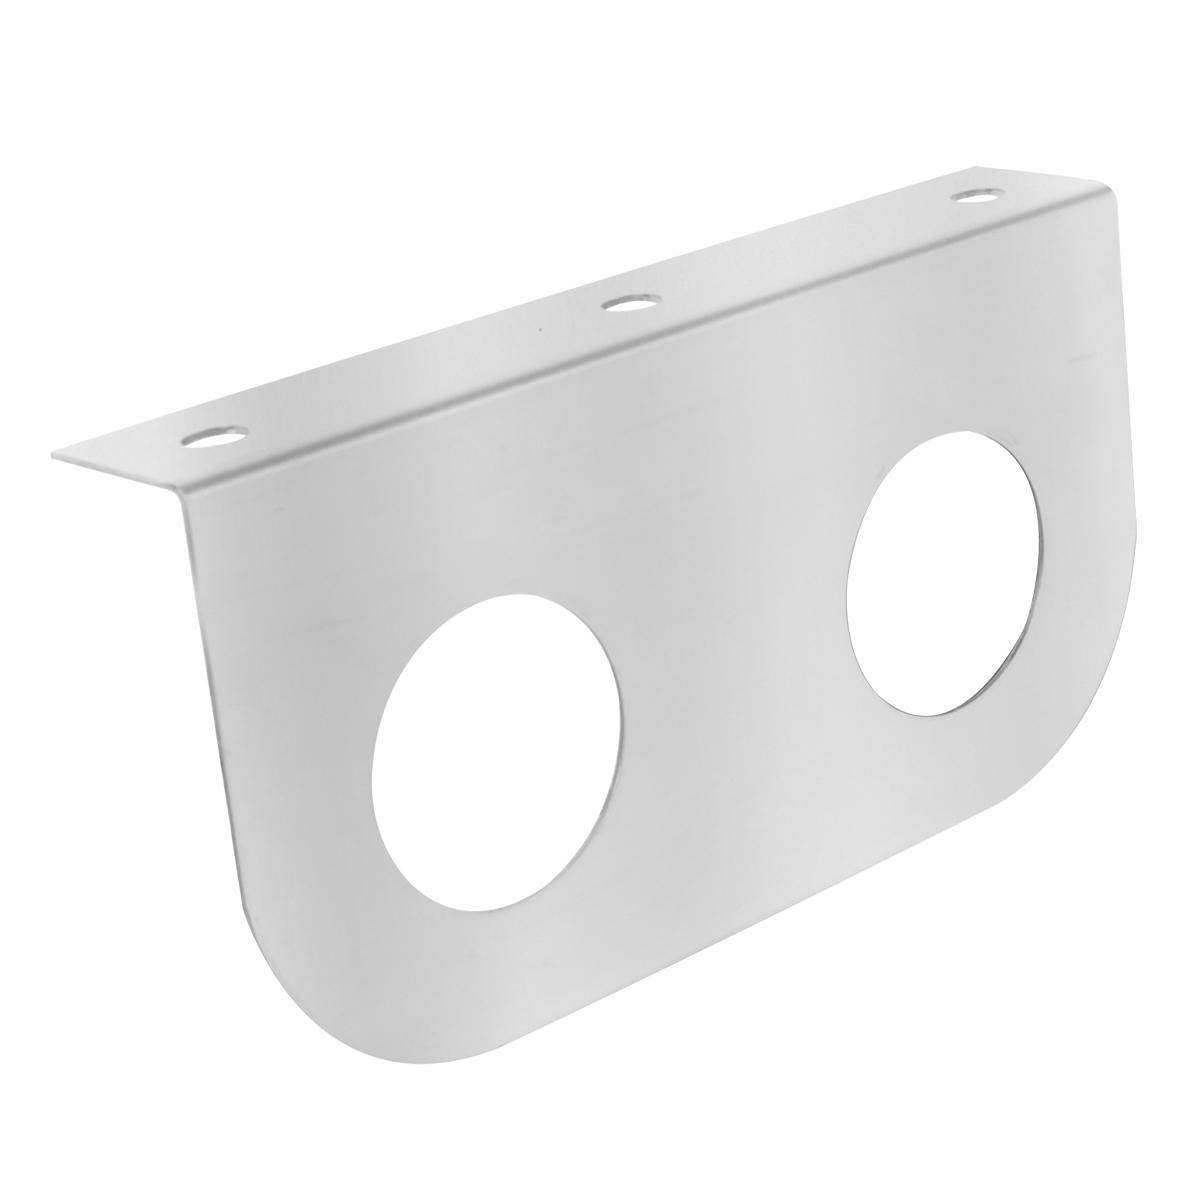 #81453 Stainless Steel Light Bracket Only